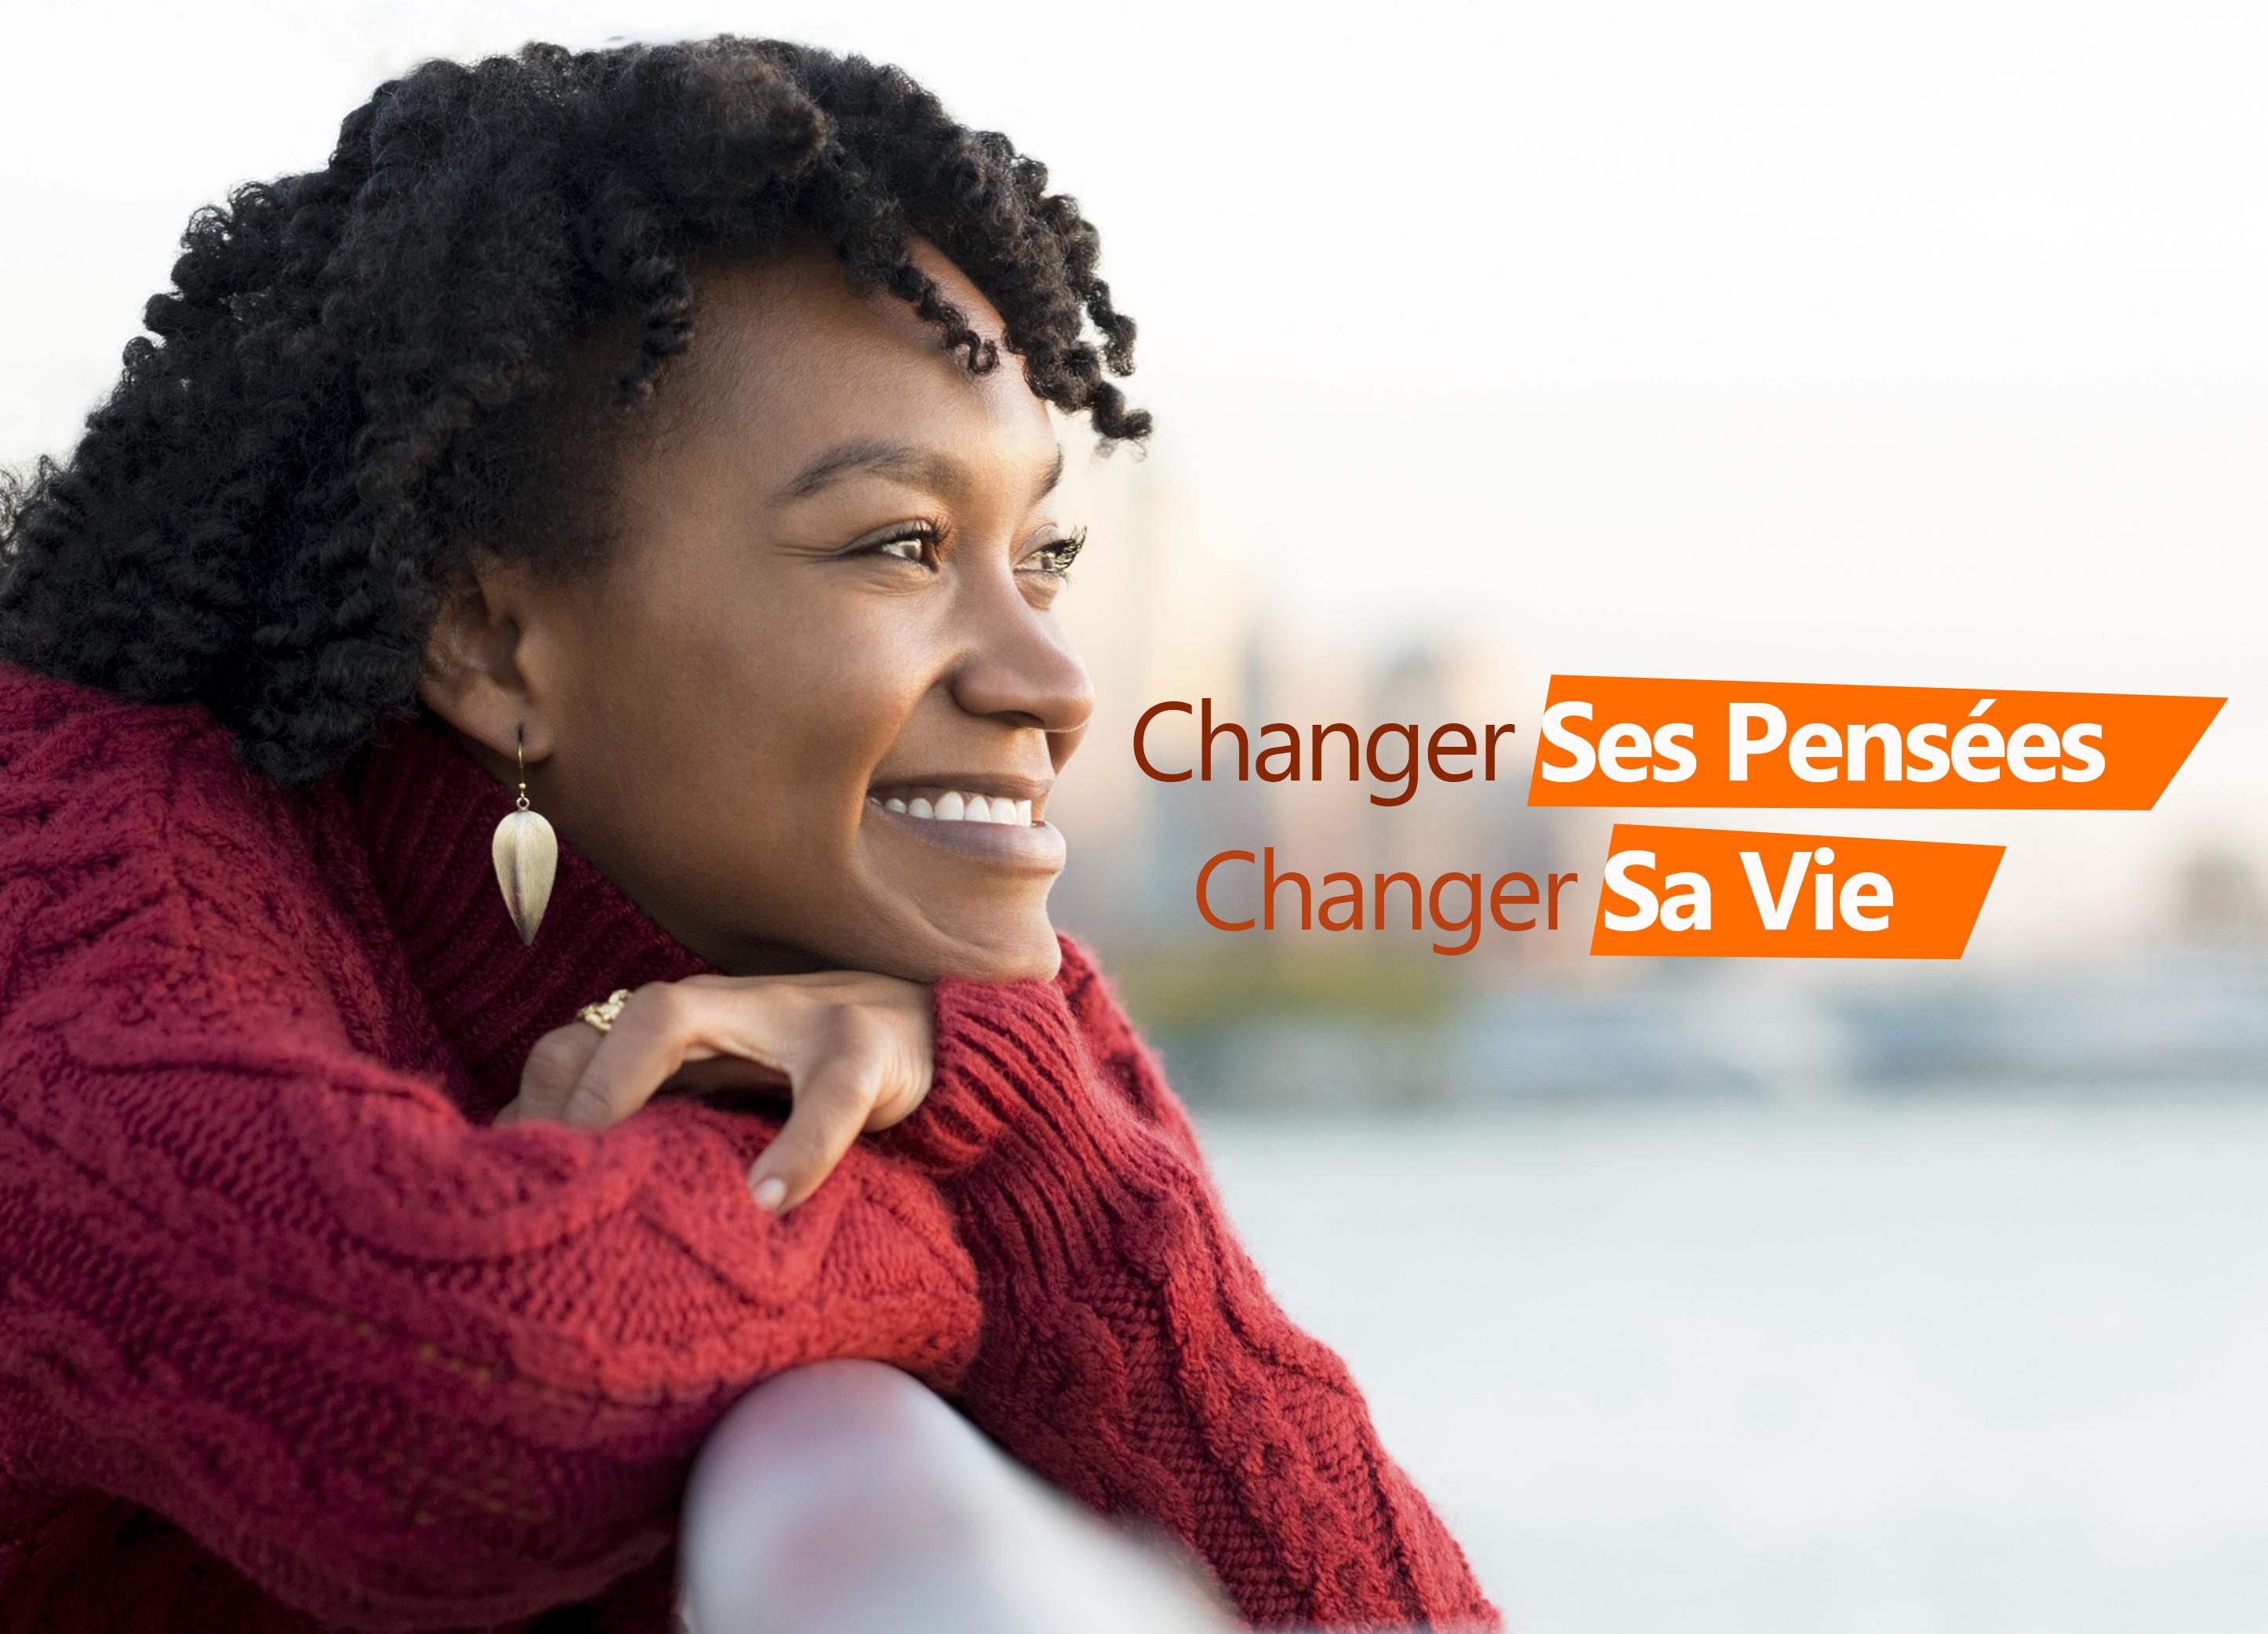 1- Changer ses pensées, changer sa vie